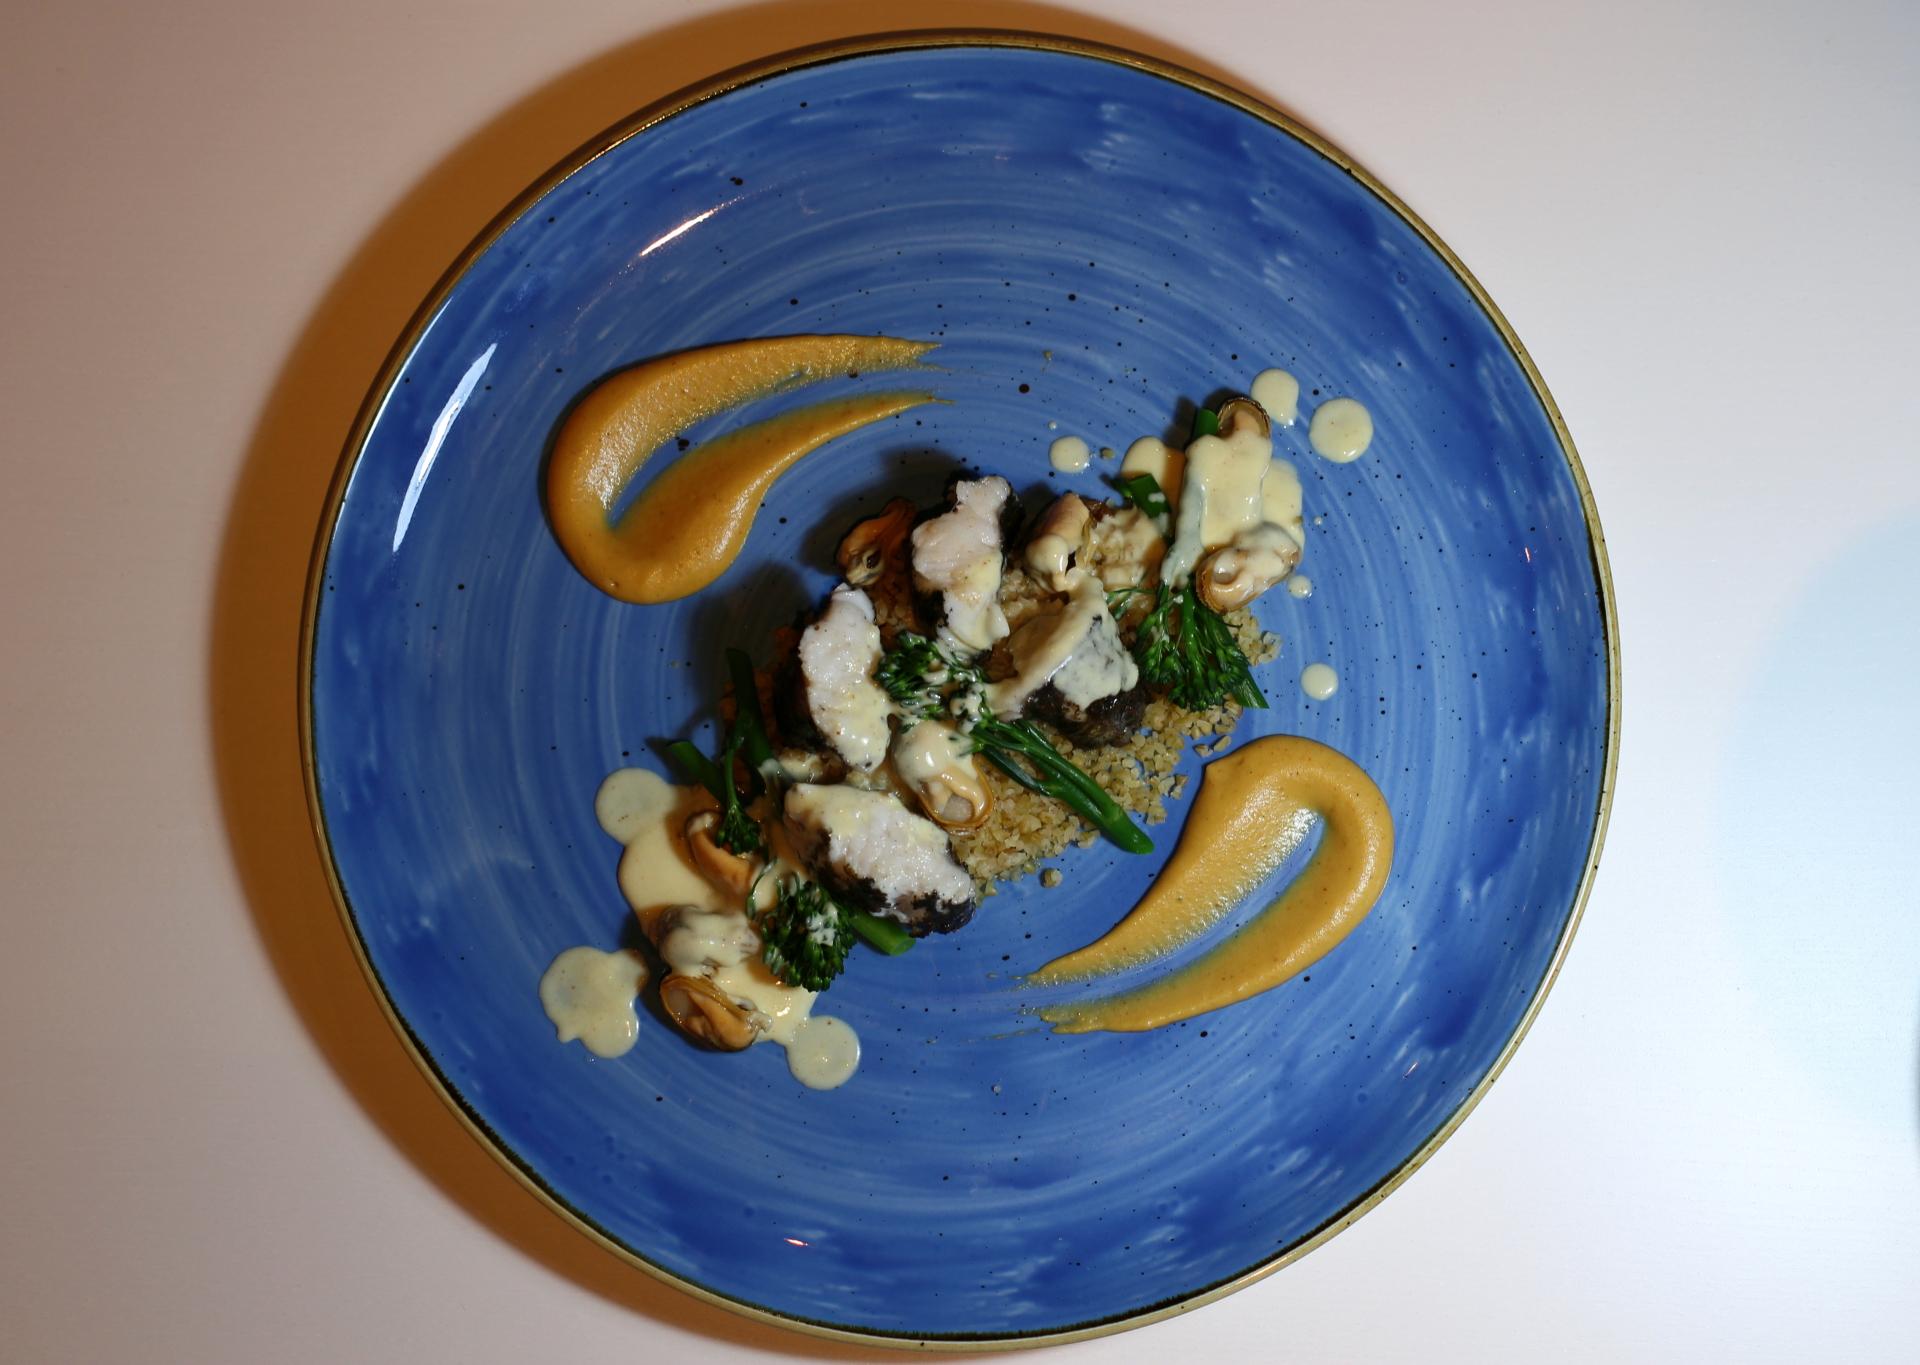 Monkfish, Butternut Squash, Broccoli